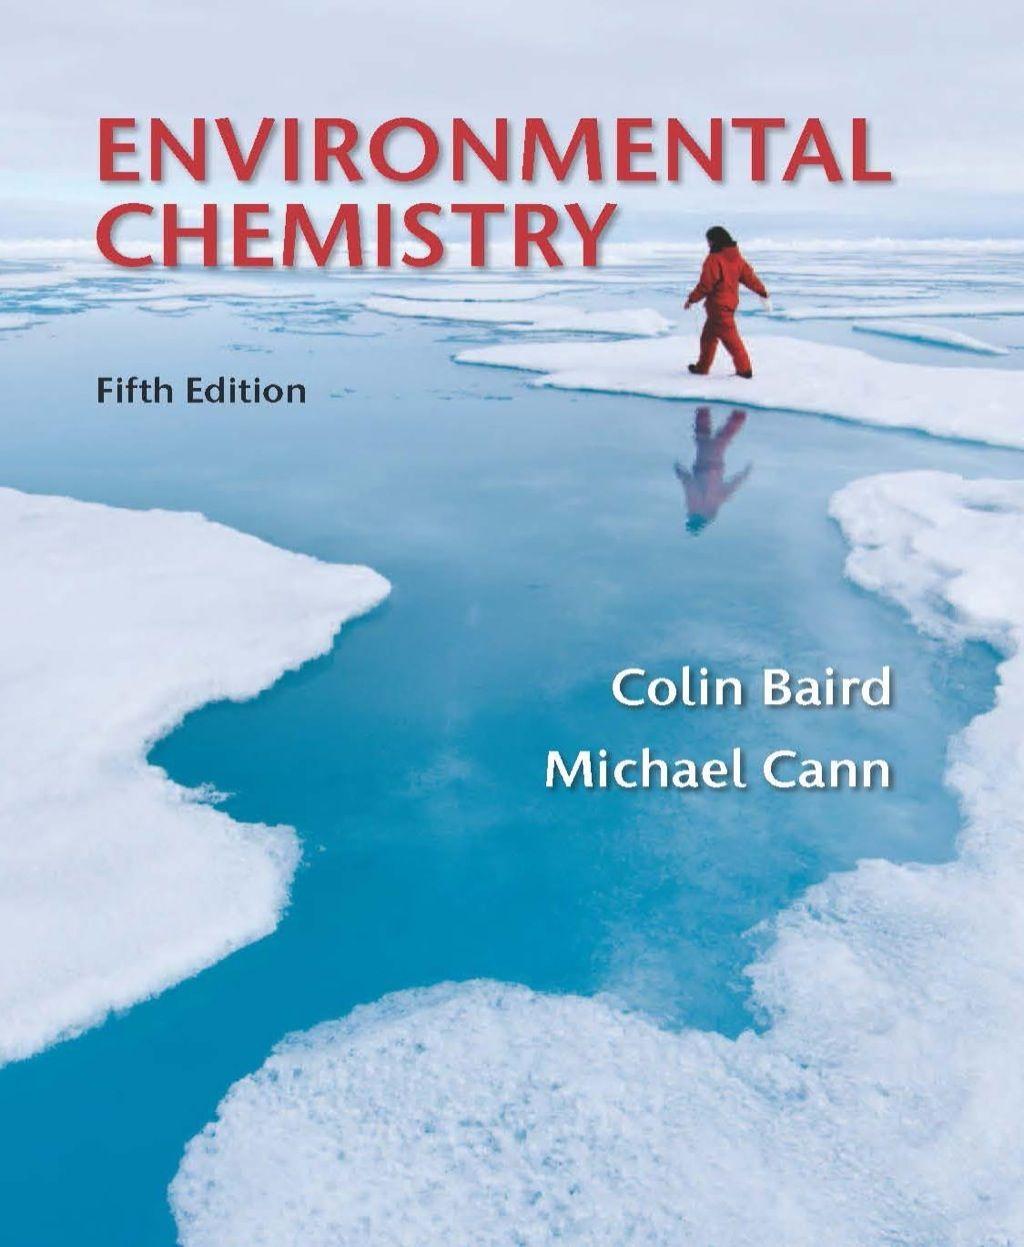 Environmental Chemistry (eBook Rental) Environmental